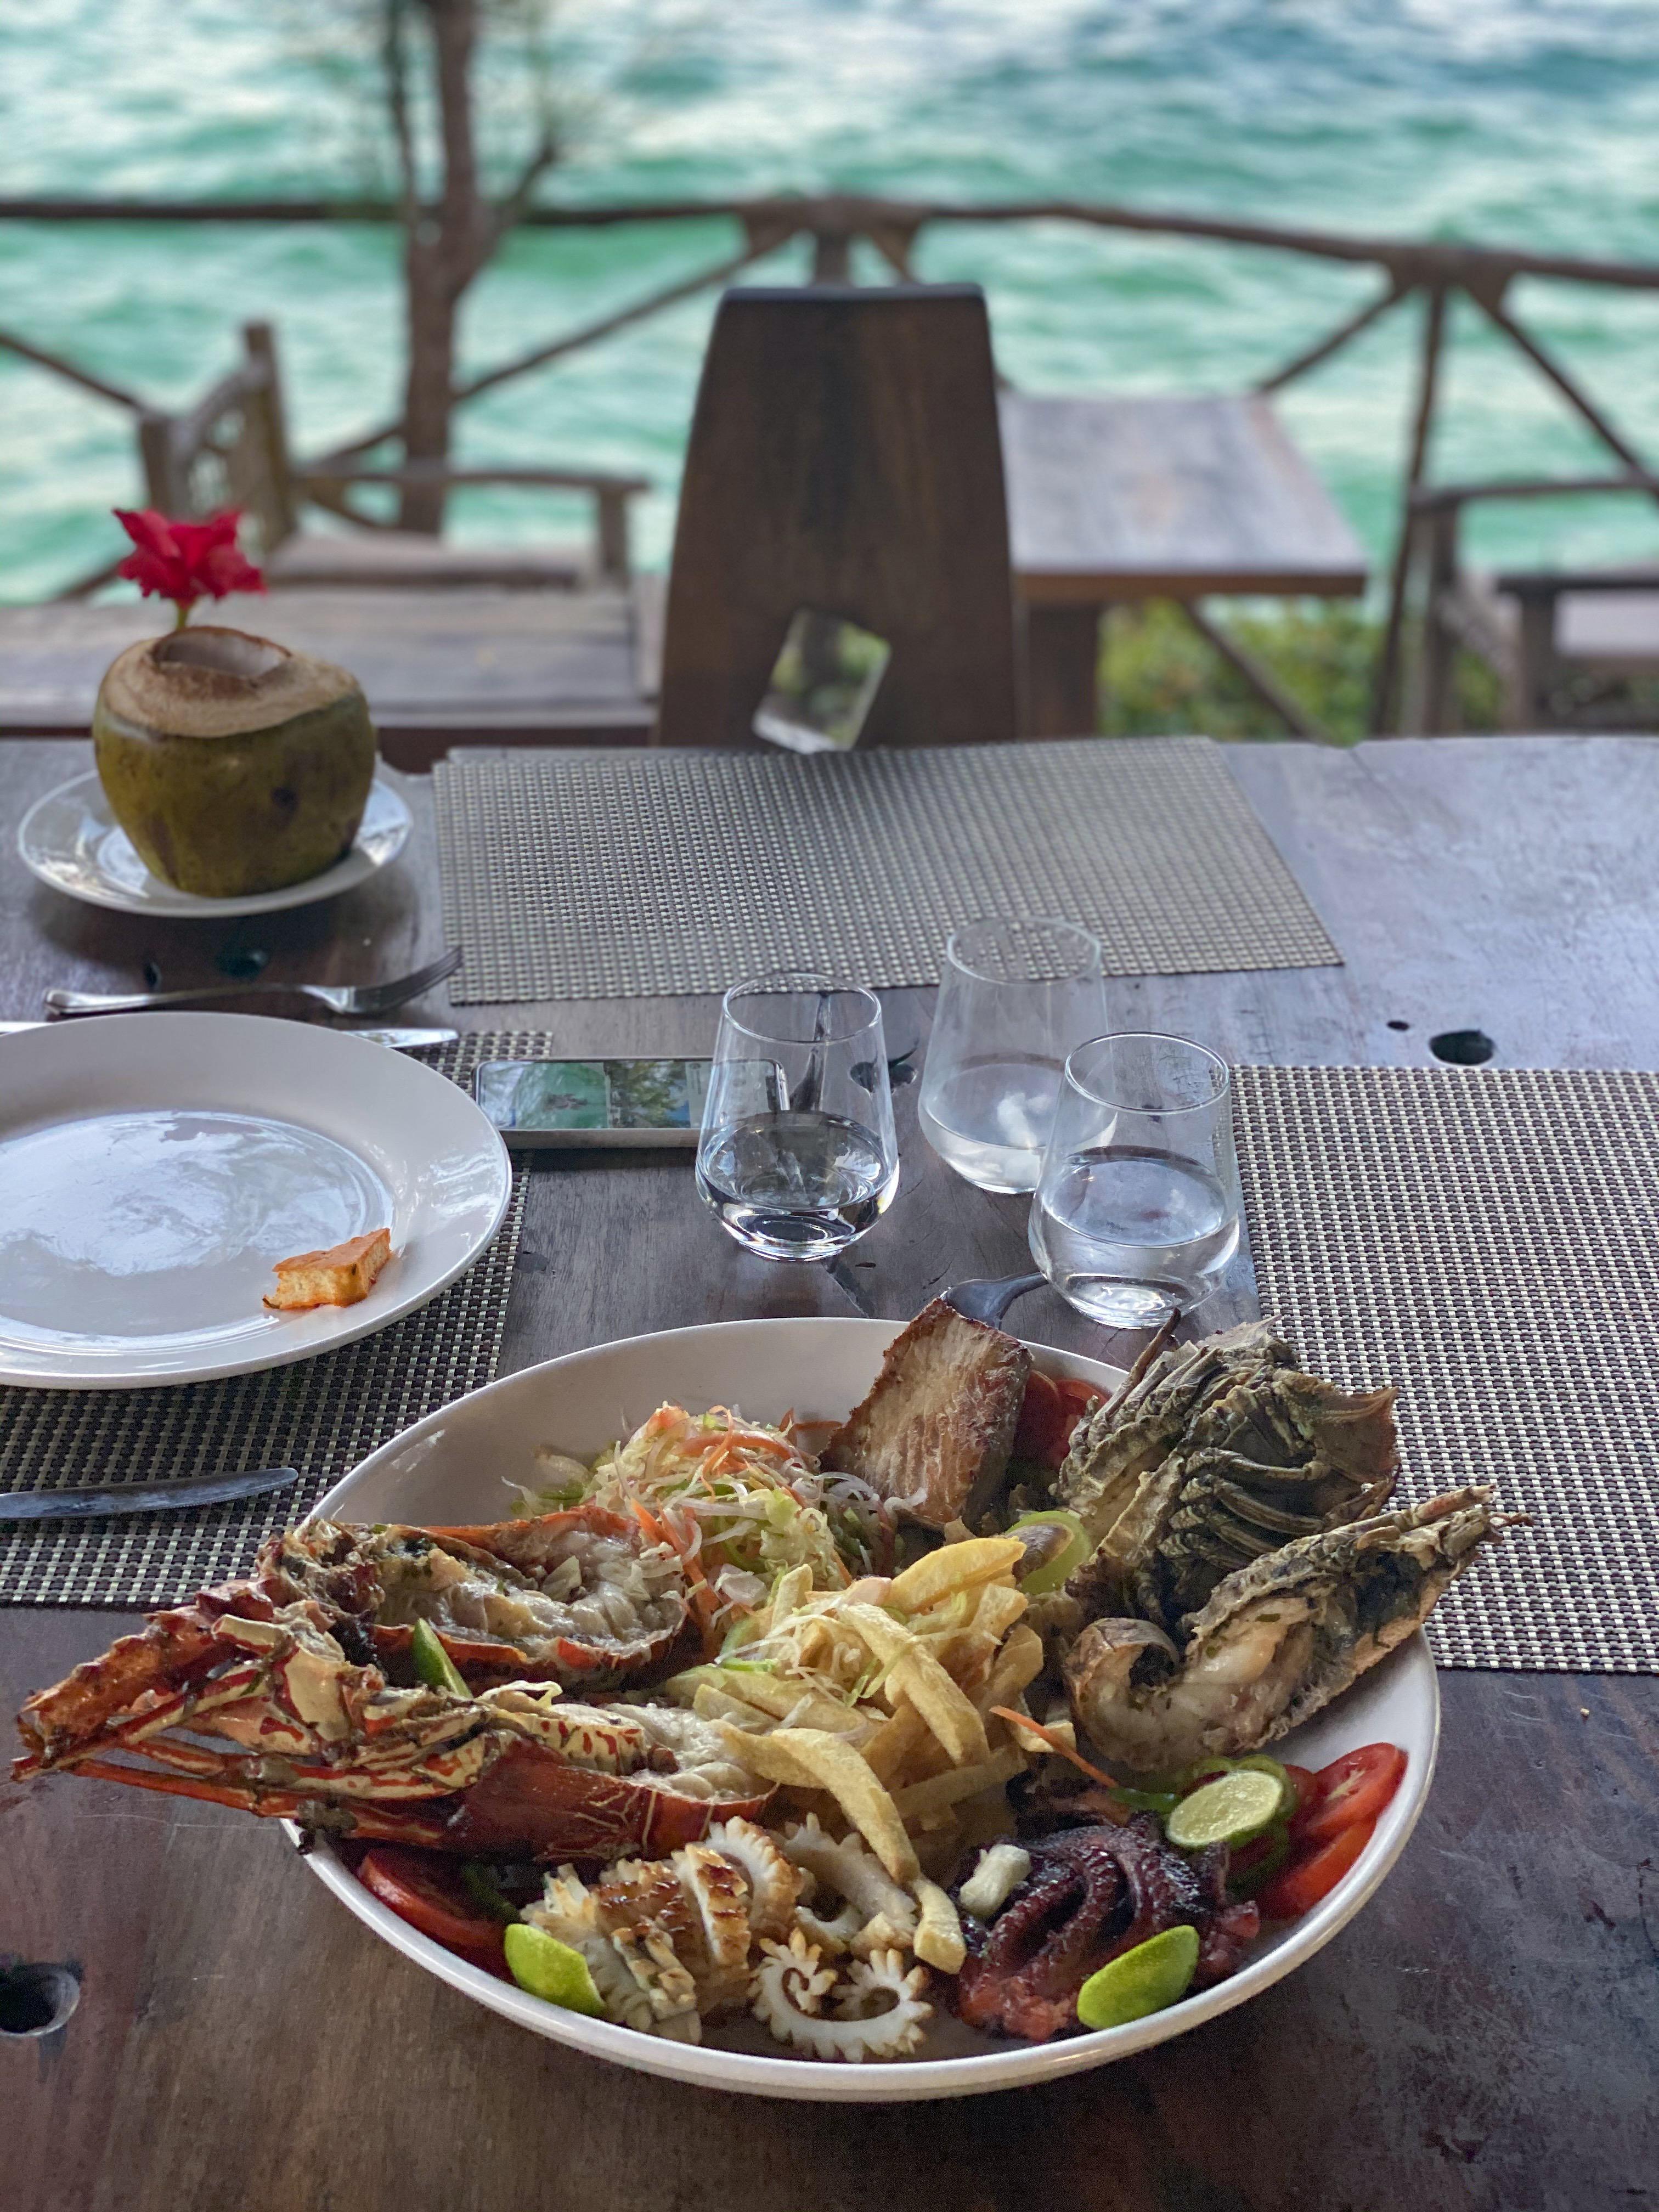 Melhores restaurantes Zanzibar - onde comer em zanzibar